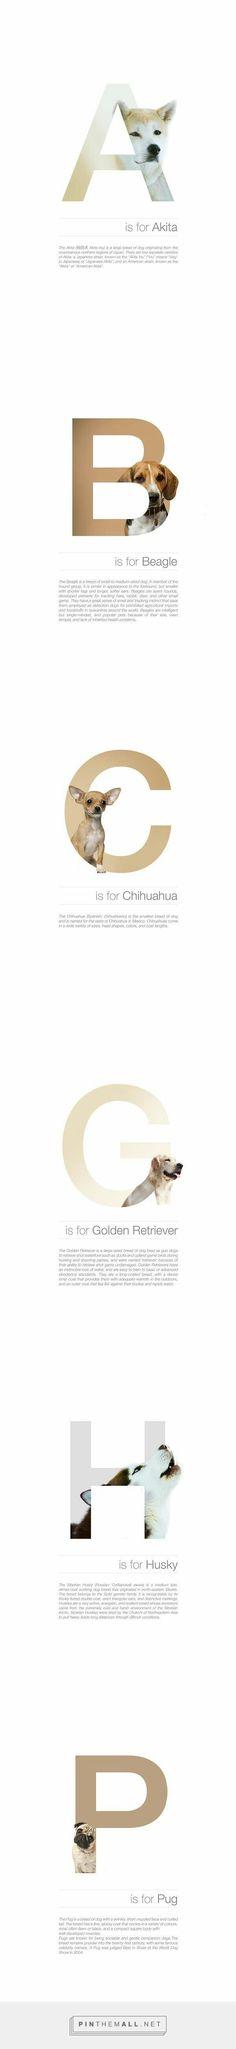 Designer Matches Letters Of The Alphabet With Different Dog Breeds - DesignTAXI. Crea Design, Creative Design, Graphisches Design, Layout Design, Design Trends, Graphic Design Typography, Graphic Design Illustration, Inspiration Typographie, Web Design Mobile